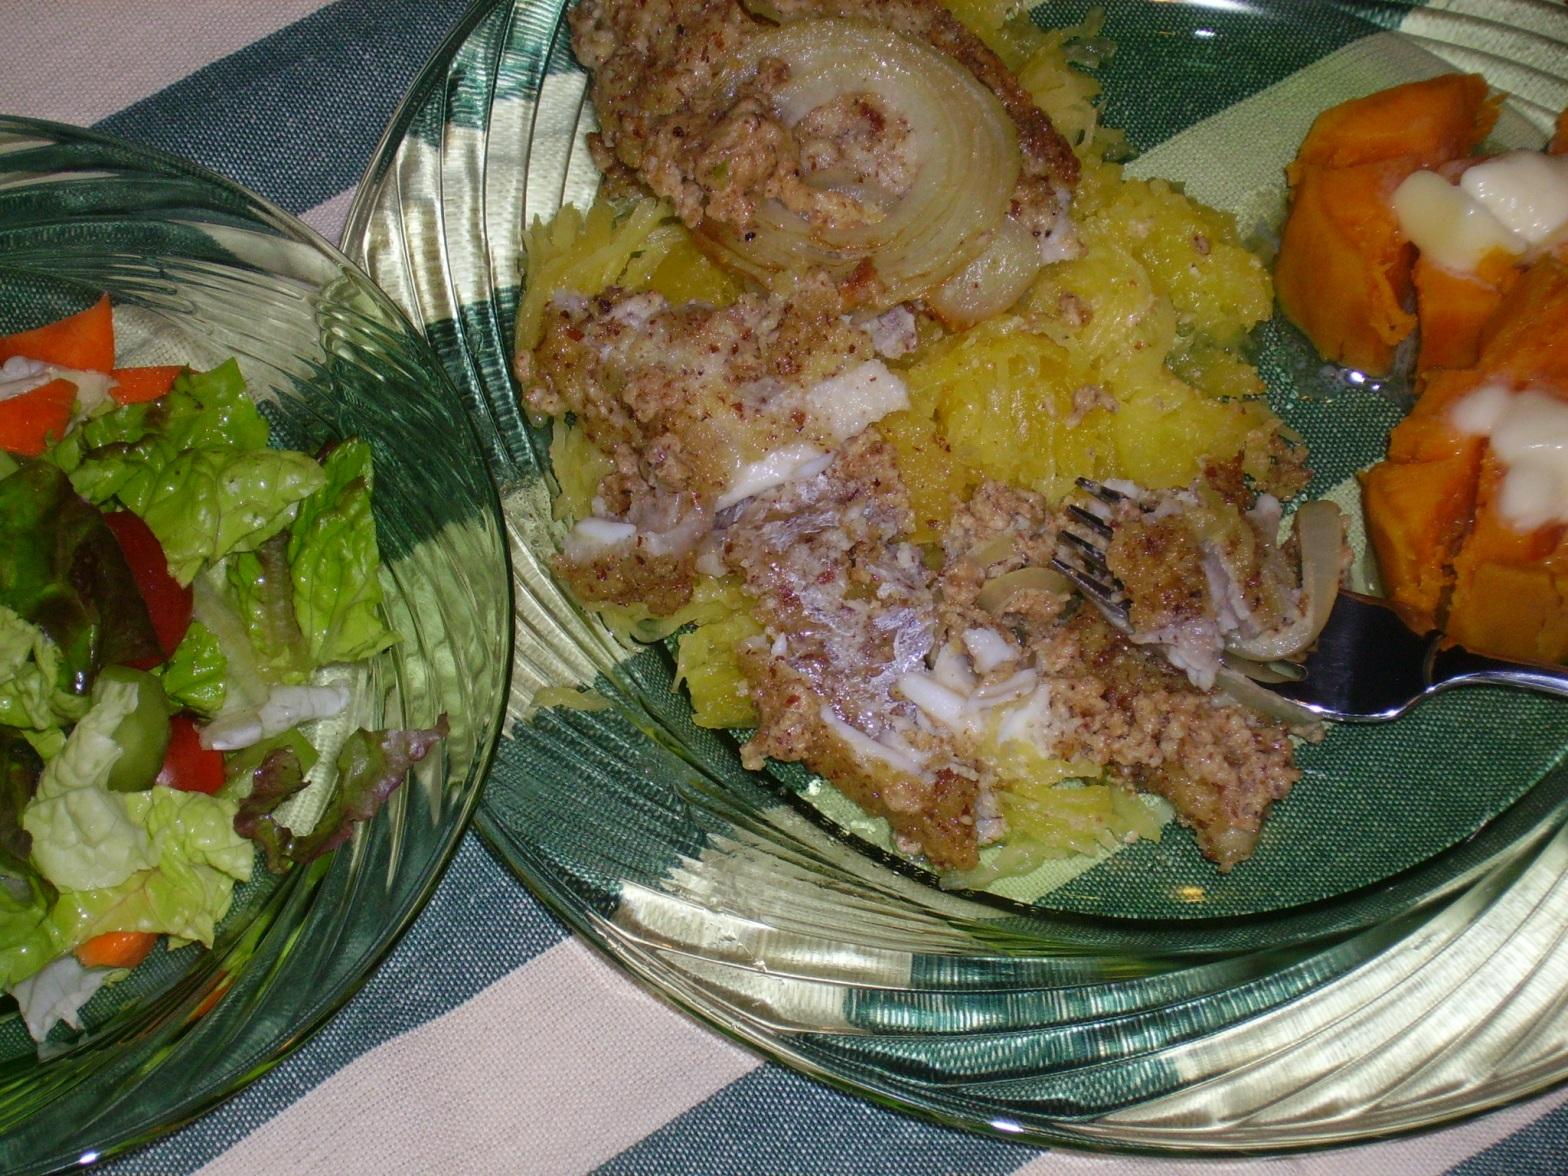 Delicious catfish dinner